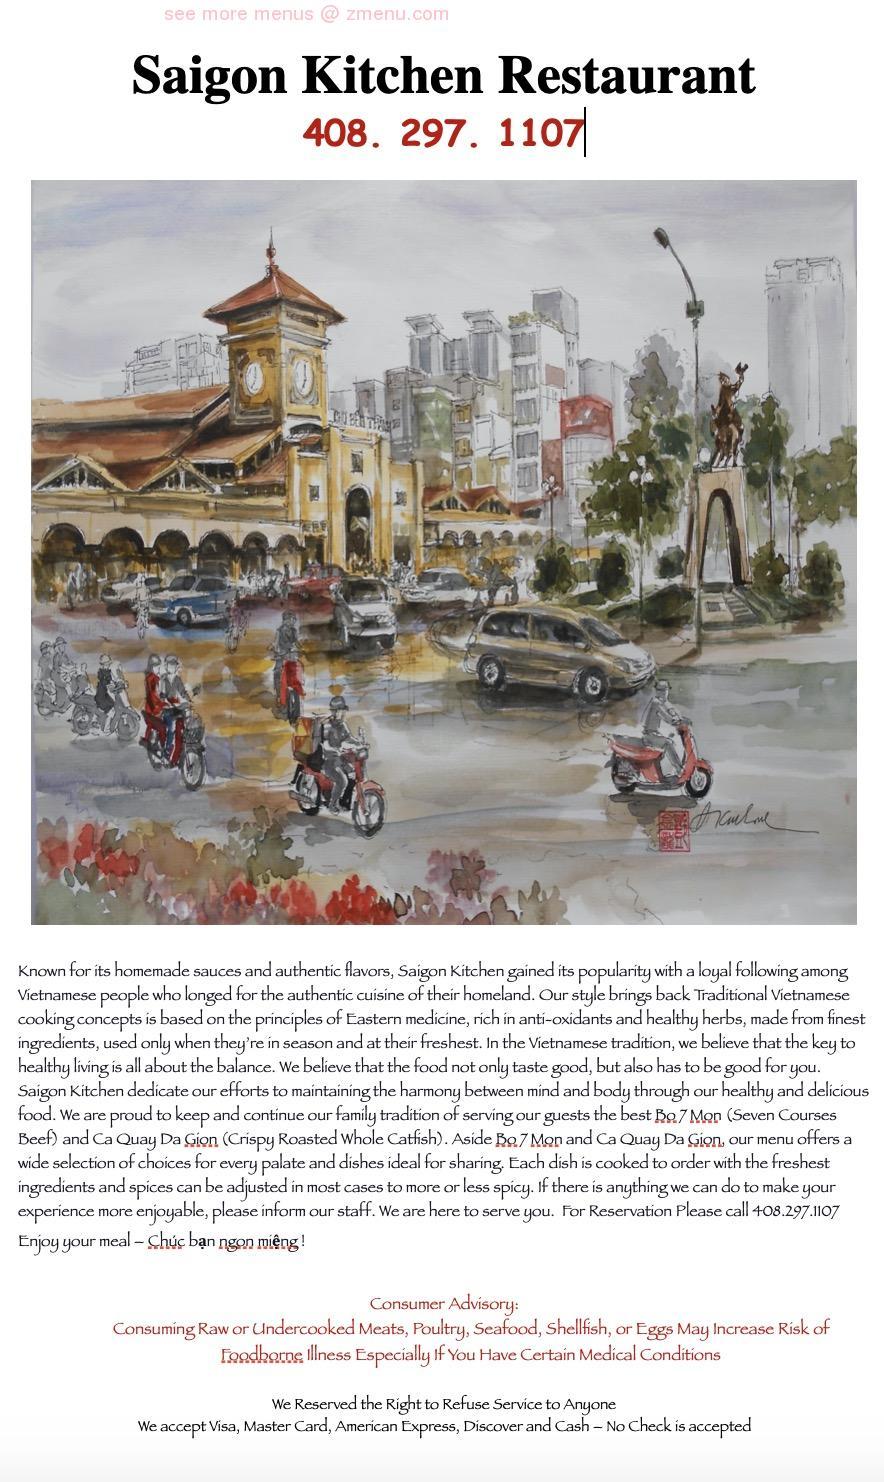 Online Menu Of Saigon Kitchen Restaurant San Jose California 95109 Zmenu